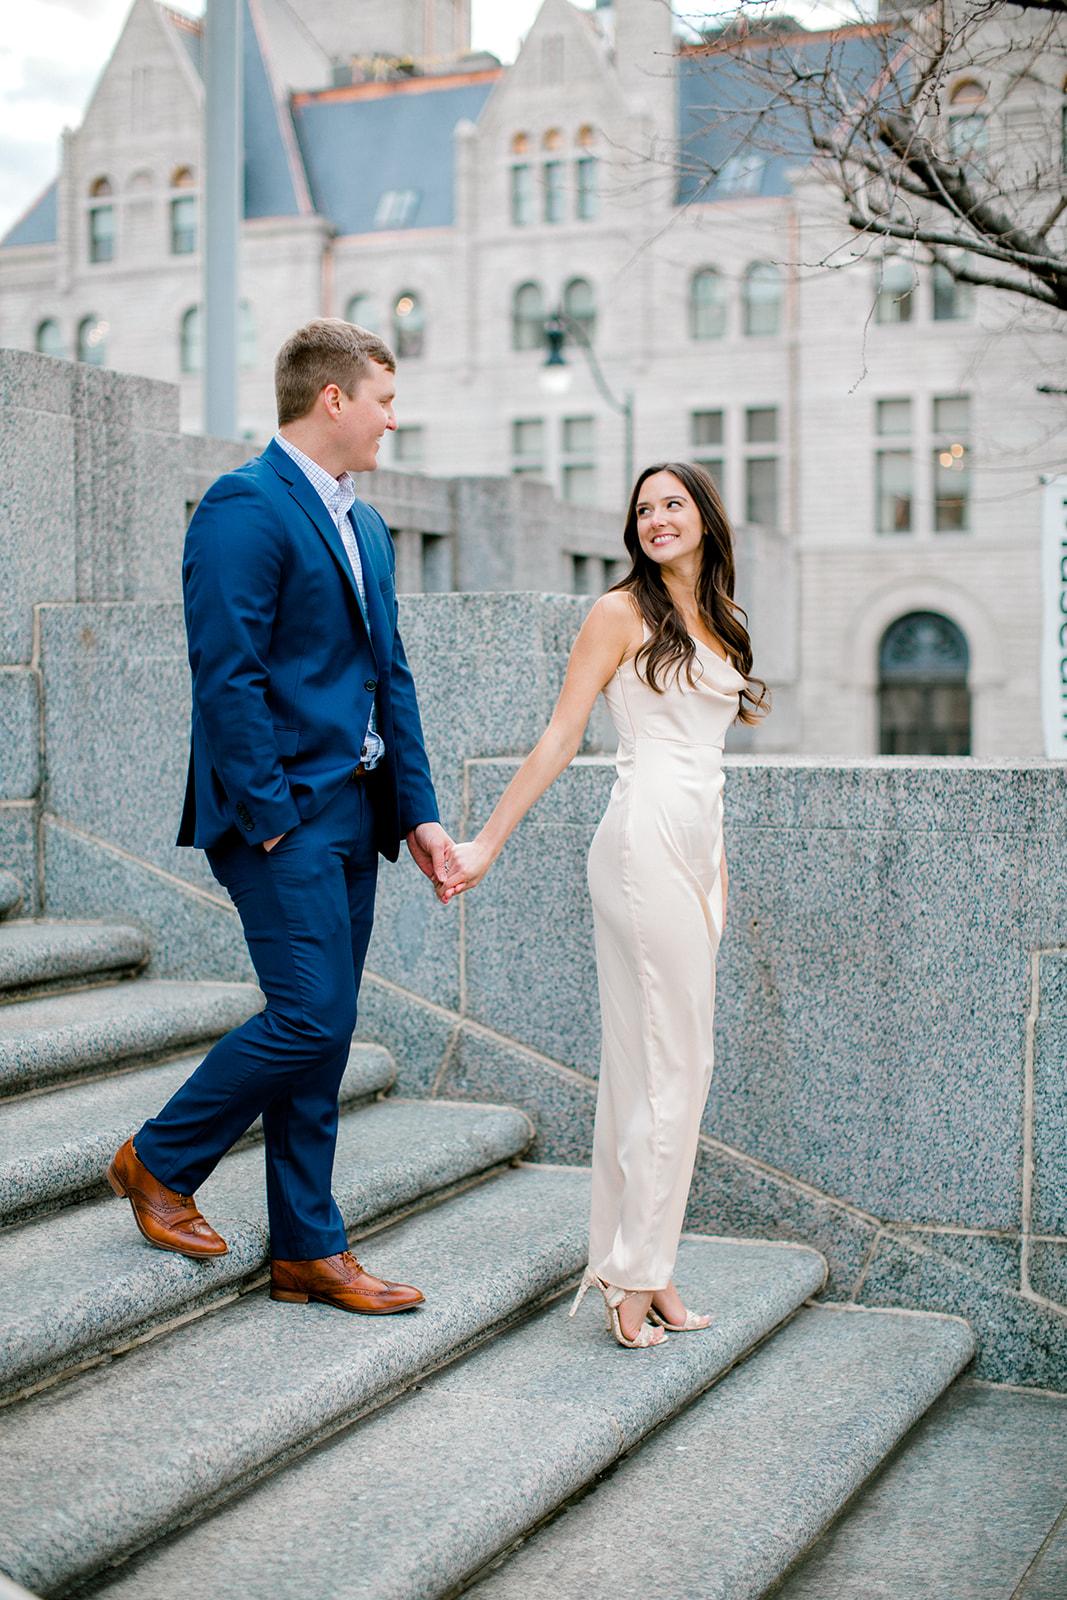 Union Station Engagement Session by Ashton Brooke Photography   Nashville Bride Guide